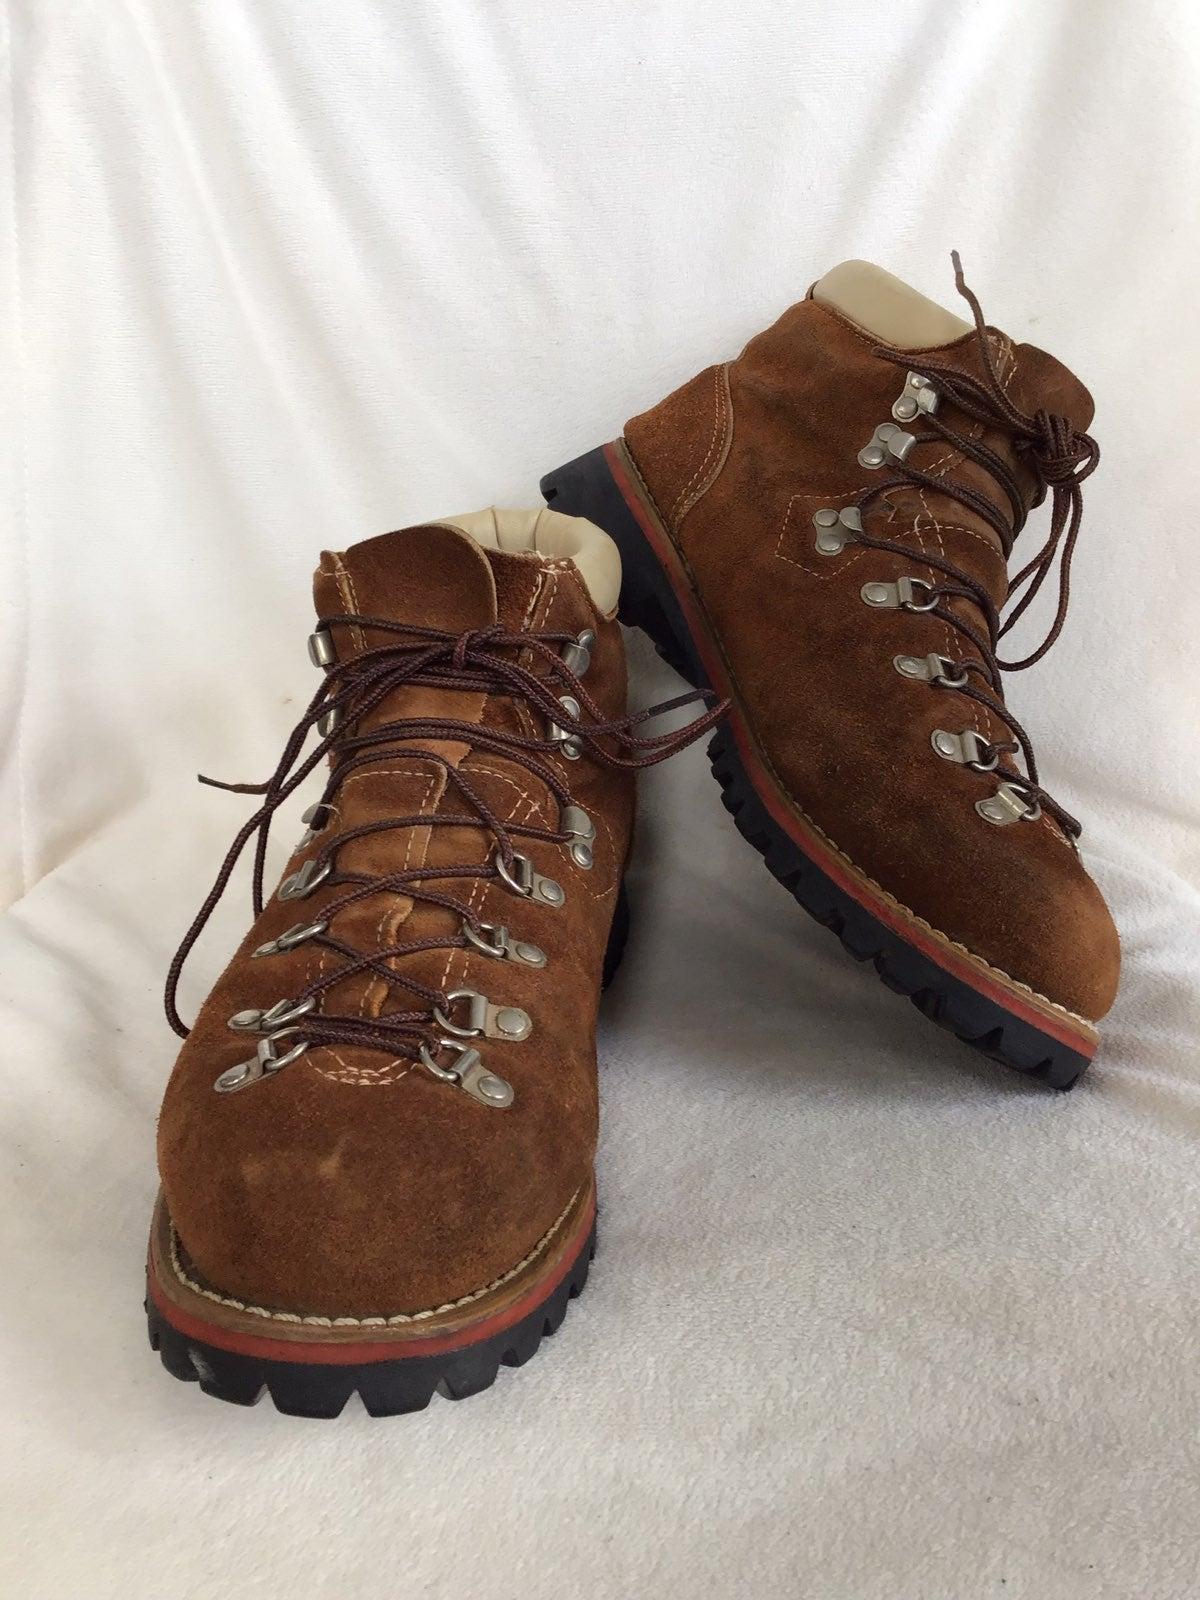 Brooks mens mountain hiking size 11 boot